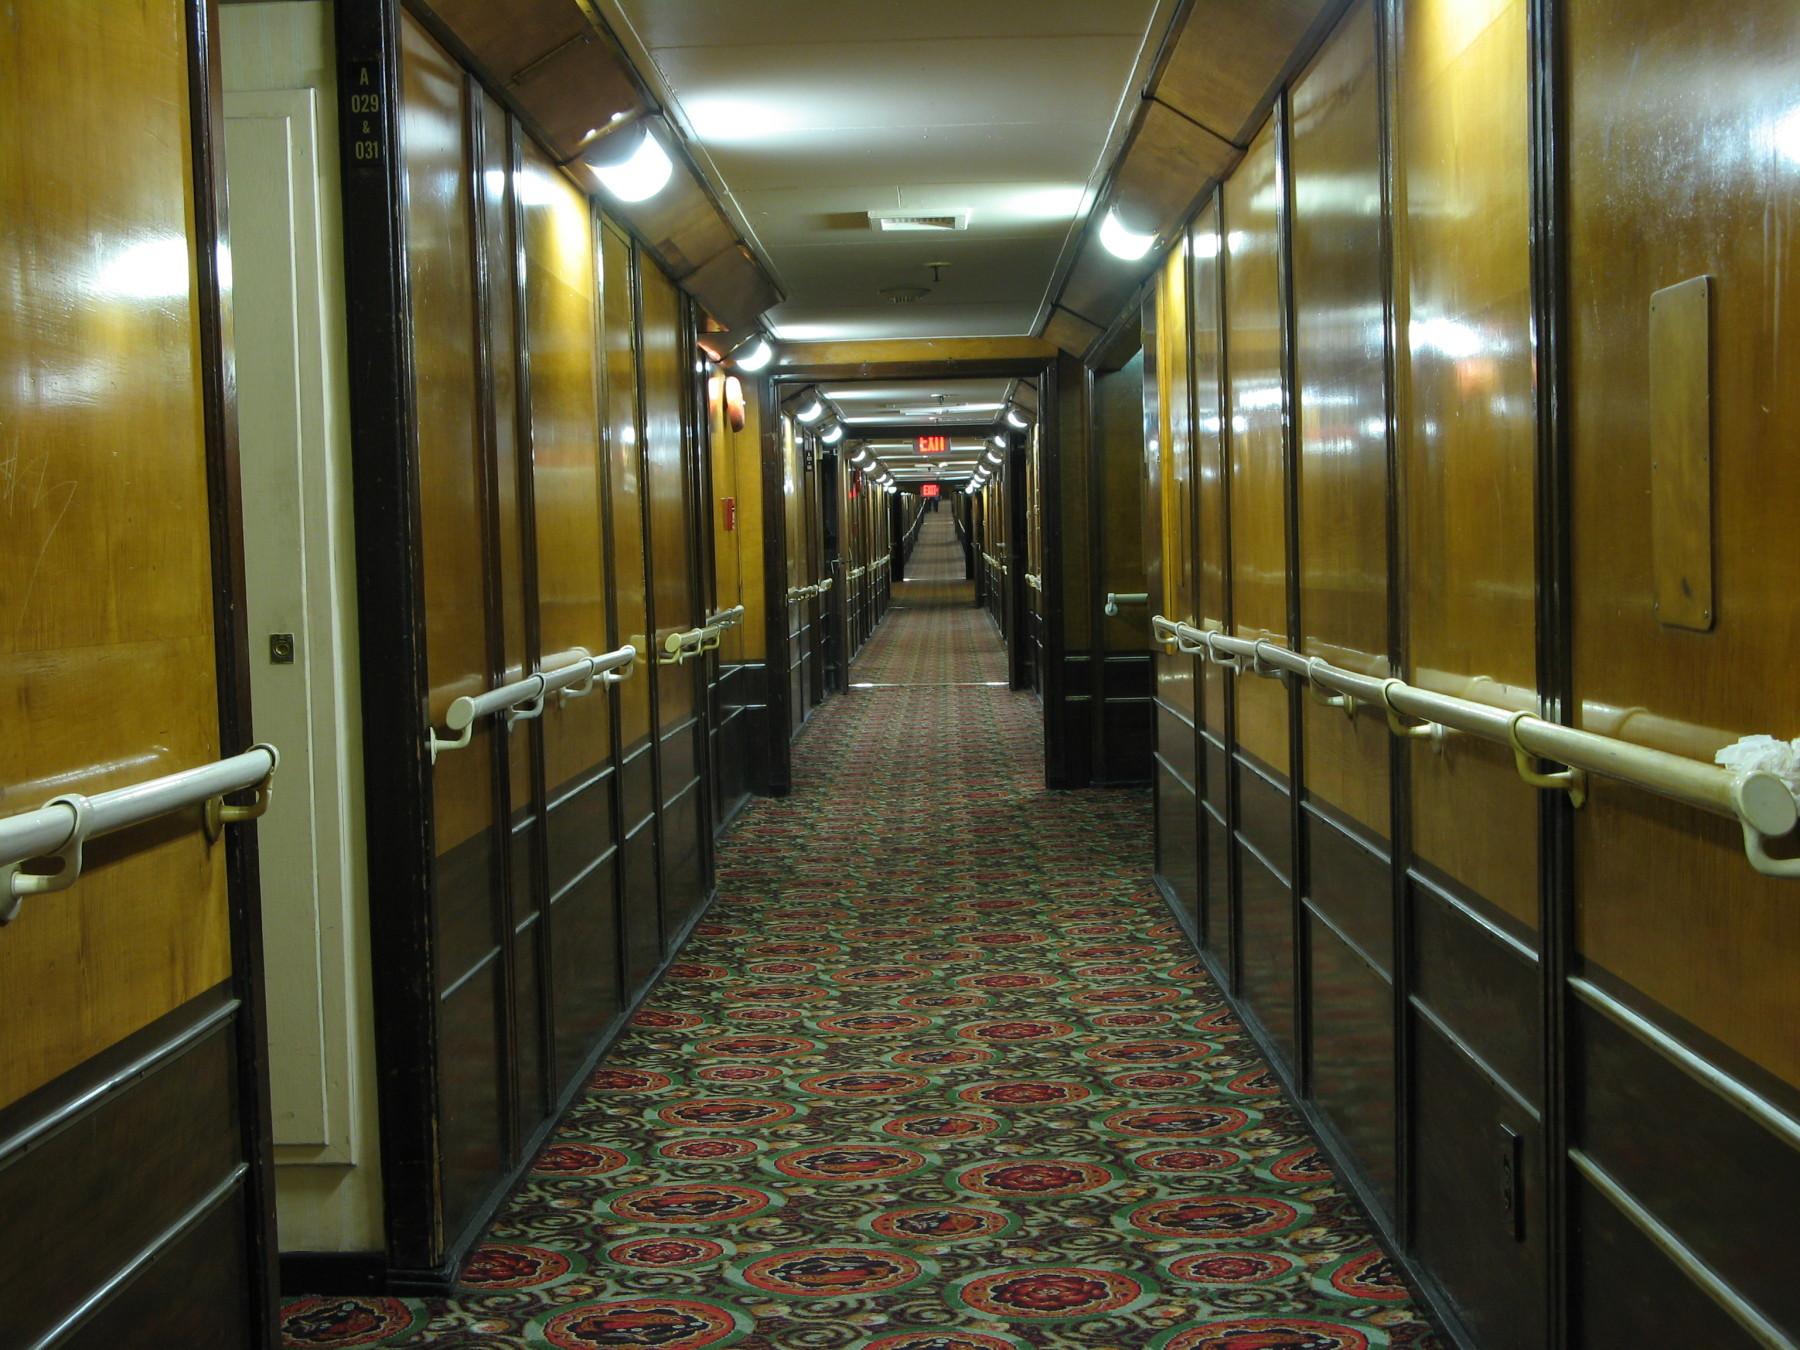 20081106015730!Queen_Mary_Hotel_Cabin_Corridor